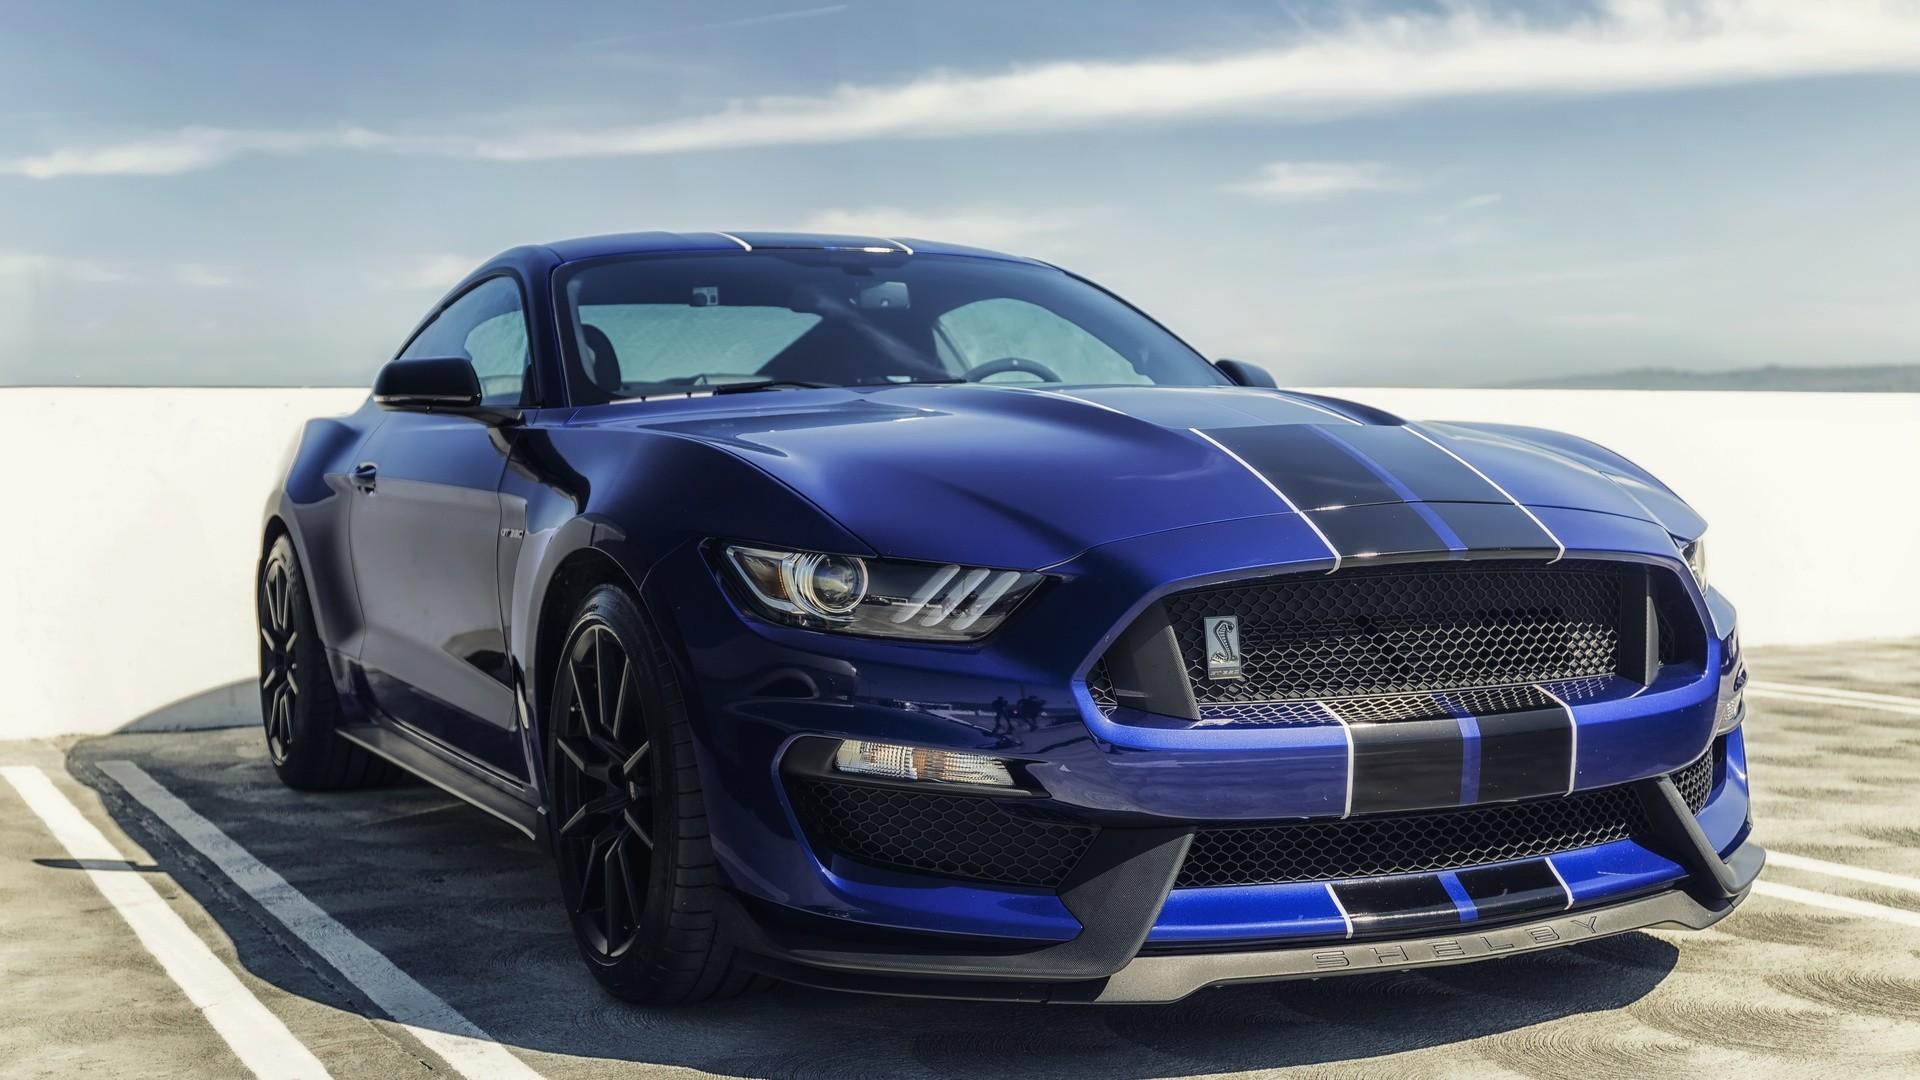 Mustang Wallpaper For Pc